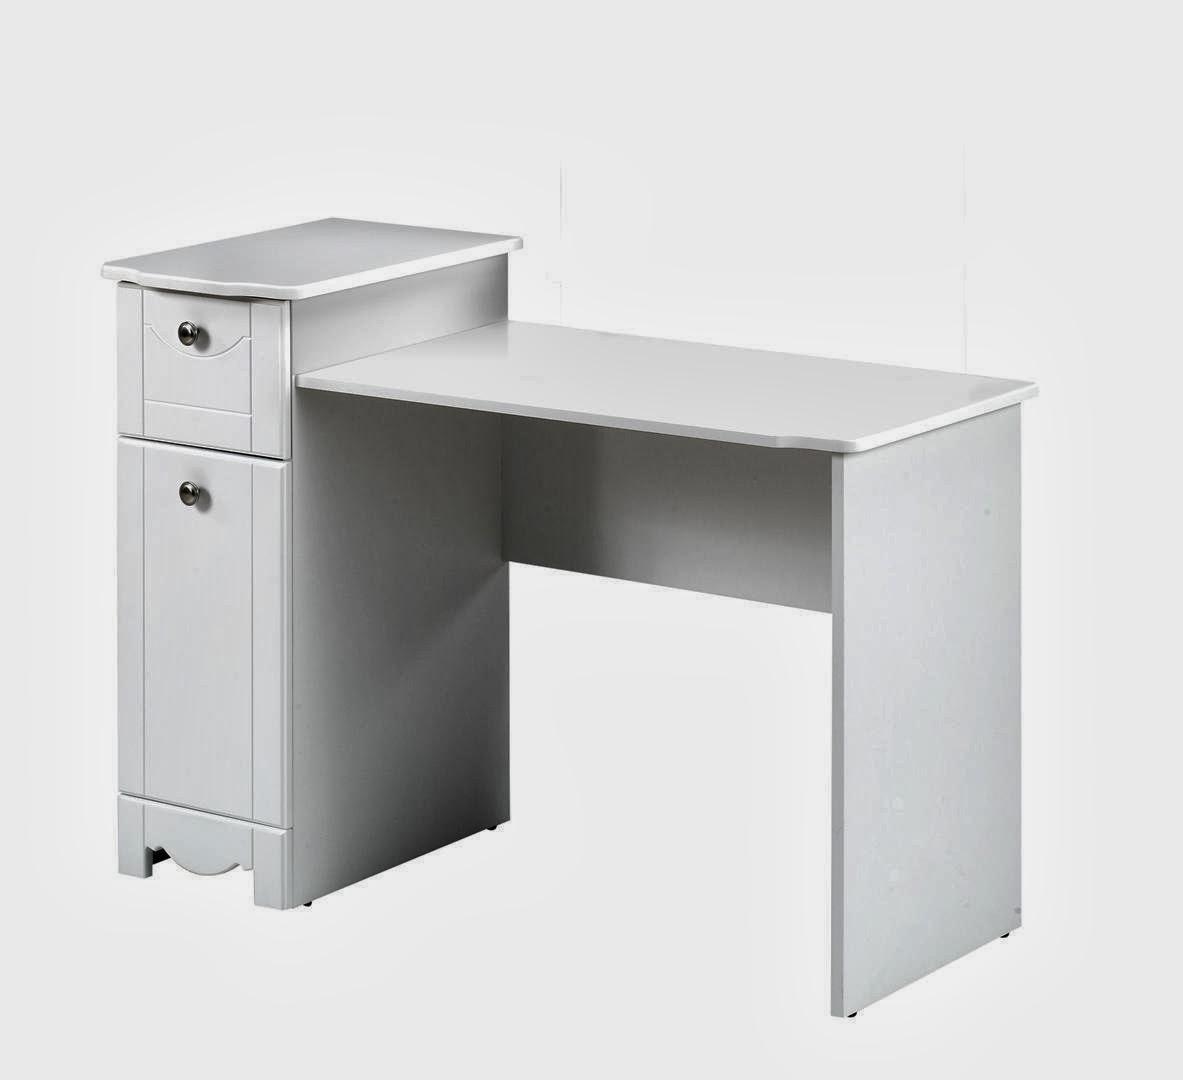 Mainstays Student Desk White Mainstays White Computer Student Desk New Ebay Mainstays Student